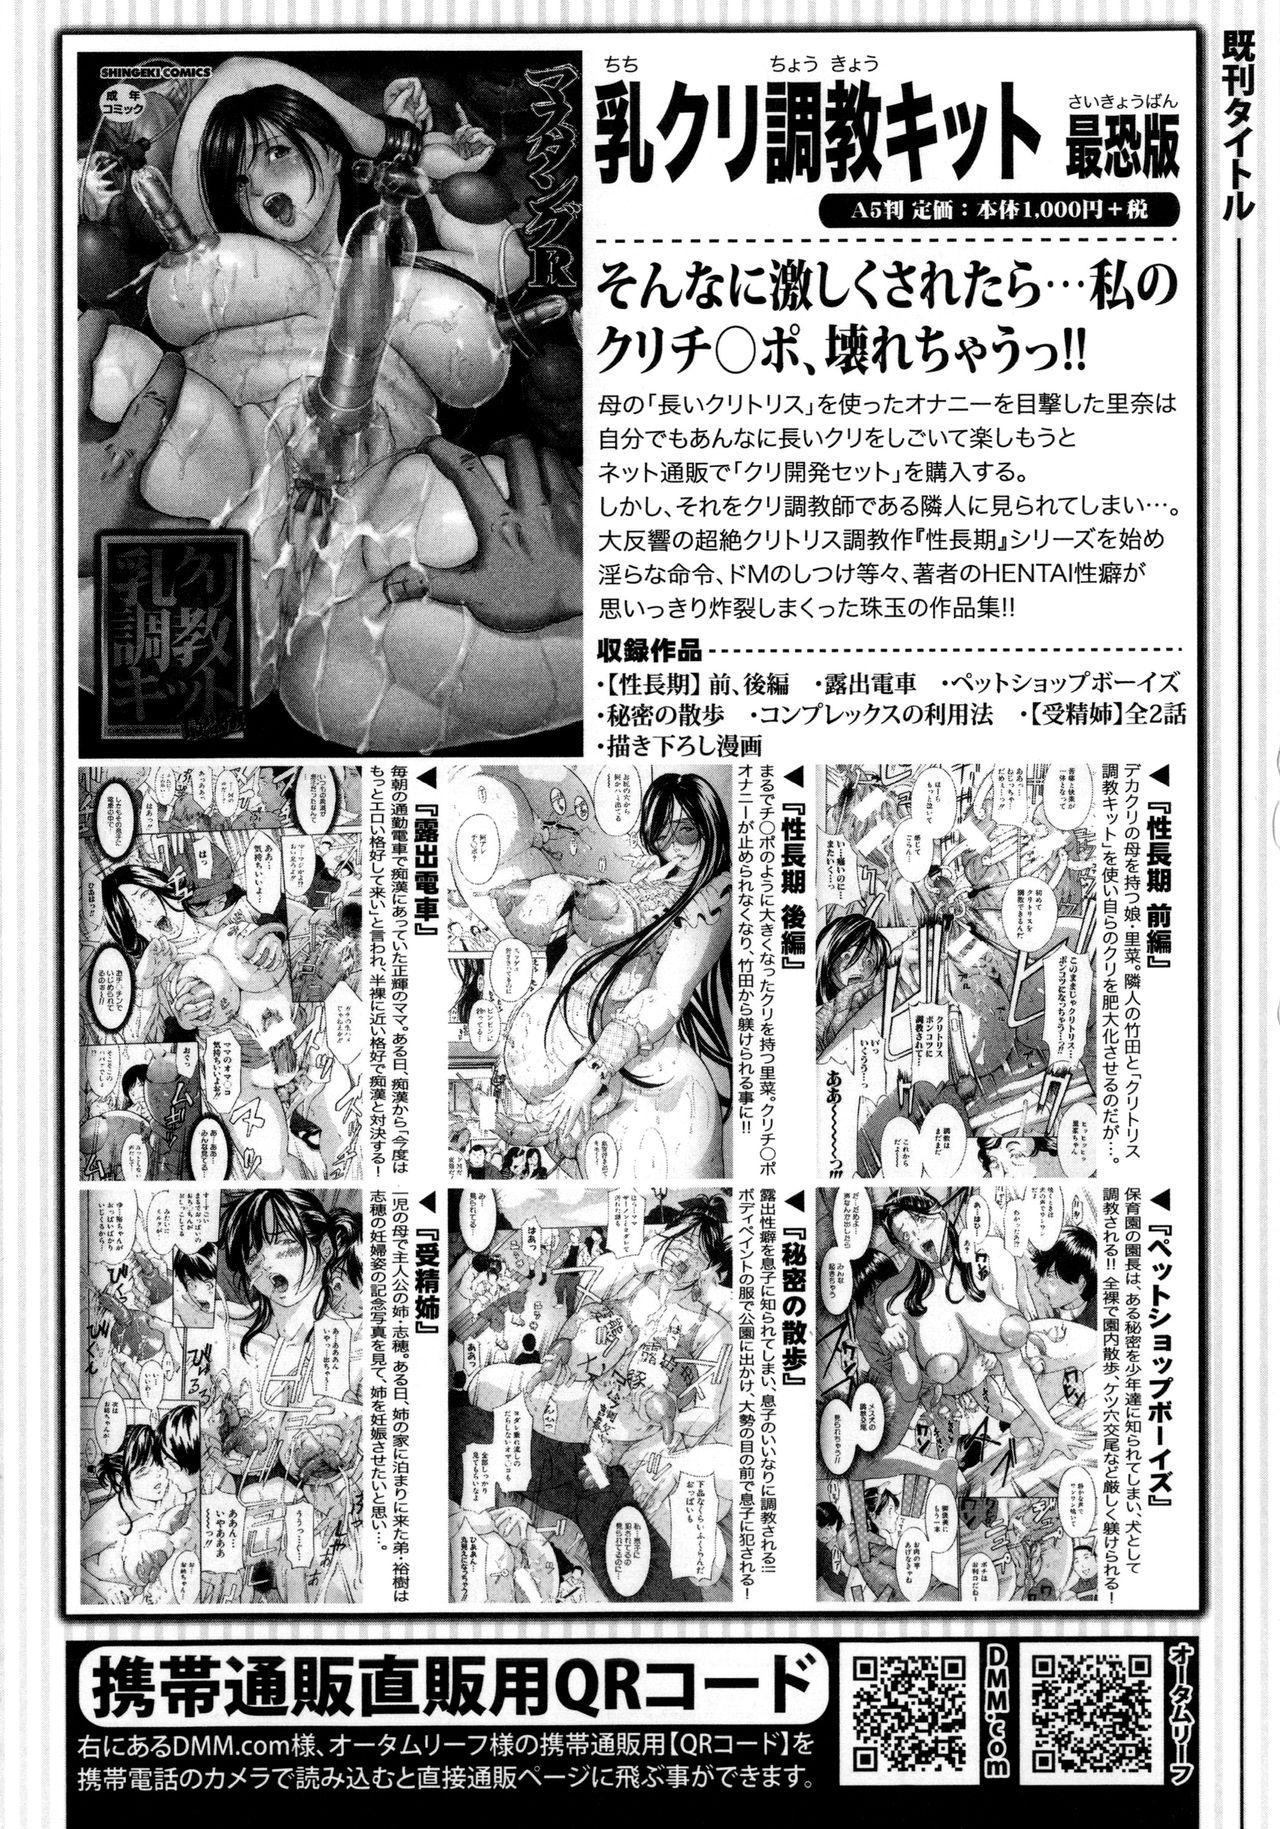 [Yoshimura Tatsumaki] Monzetsu Taigatame ~Count 3 de Ikasete Ageru~ | Faint in Agony Bodylock ~I'll make you cum on the count of 3~ [English] [Brolen] 233